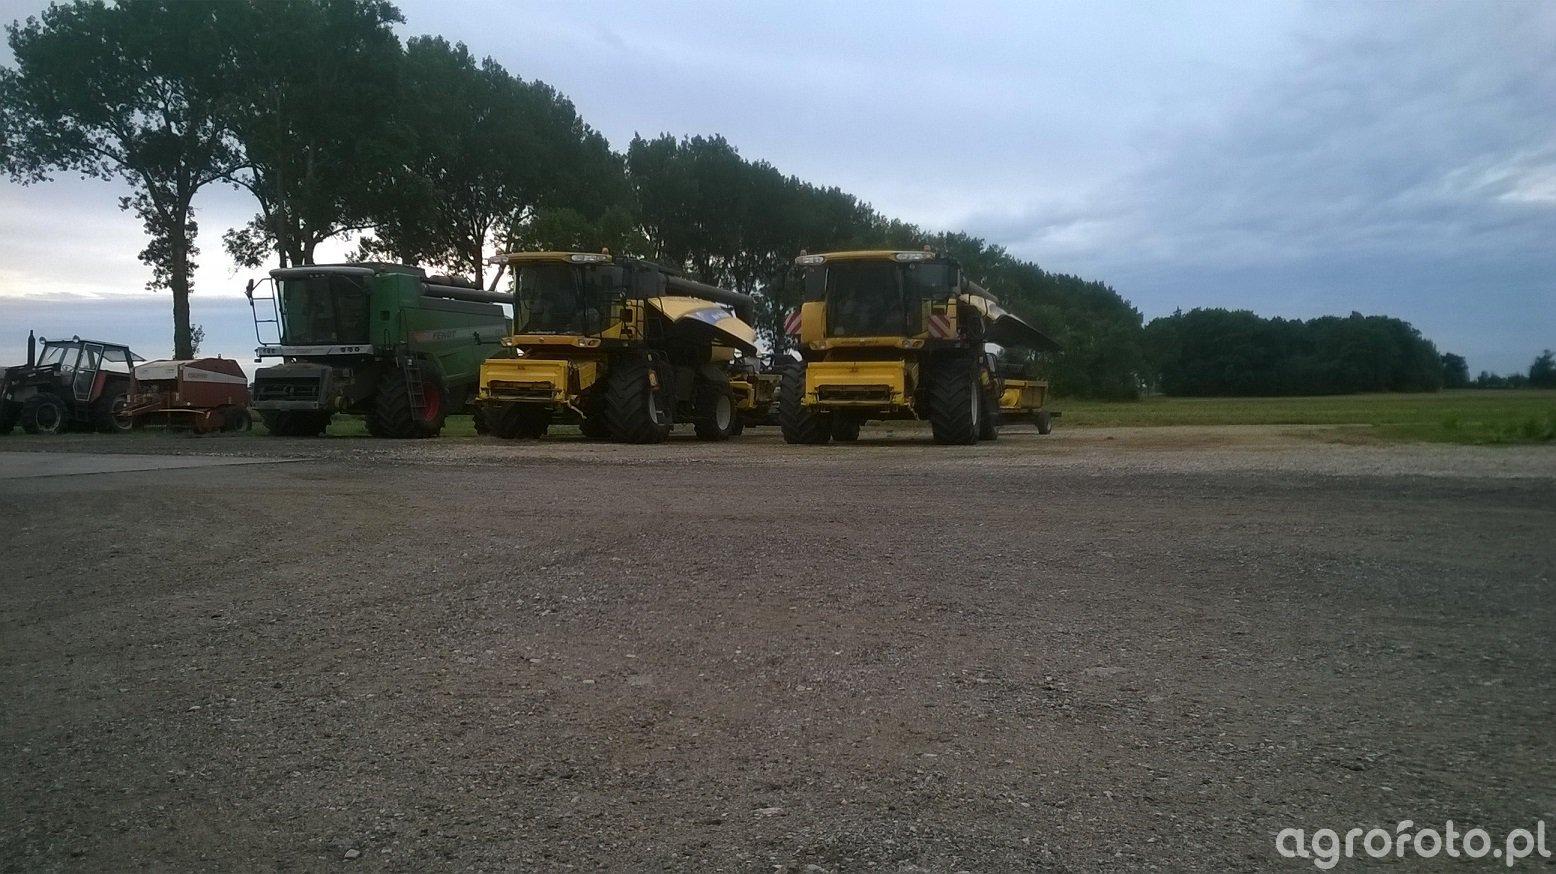 New Holland CX 8070 & CX 8060